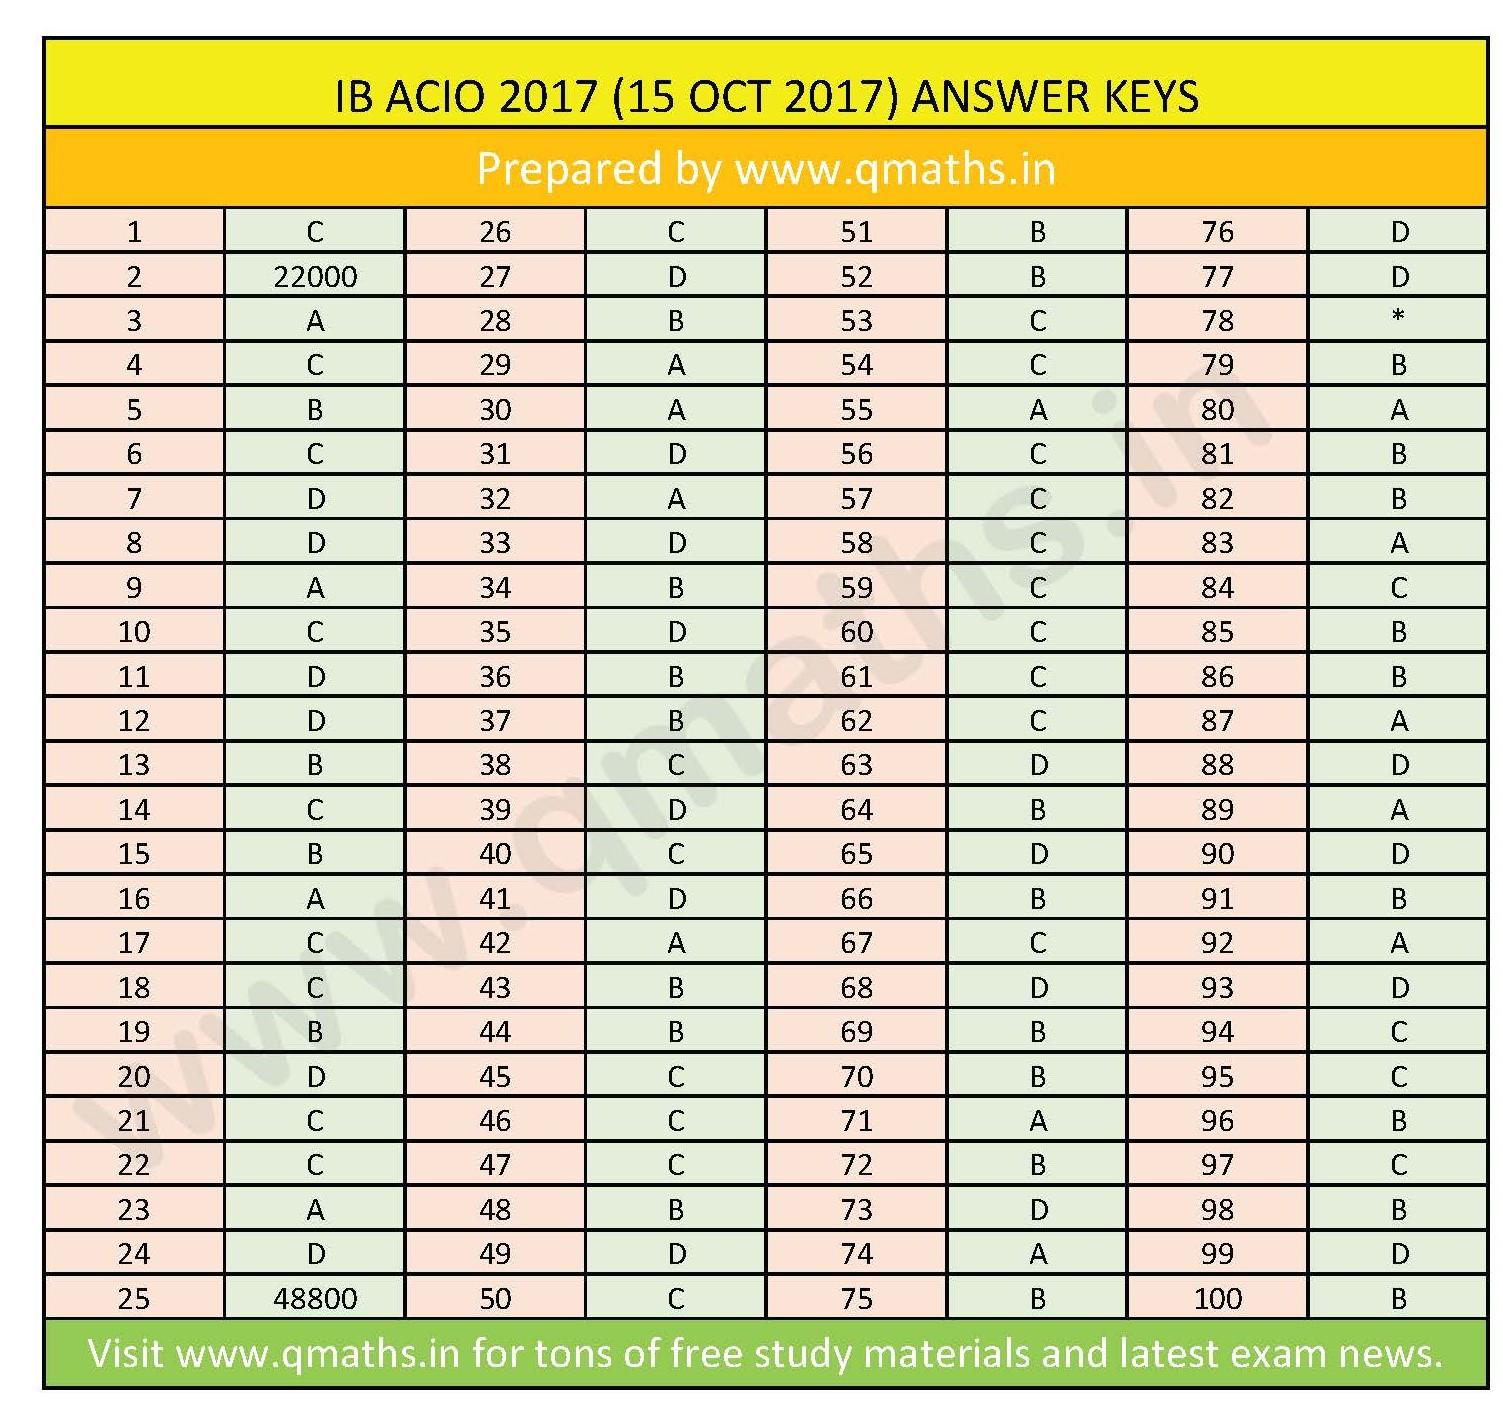 IB ACIO 2017 Answer keys Download PDF (All Sections